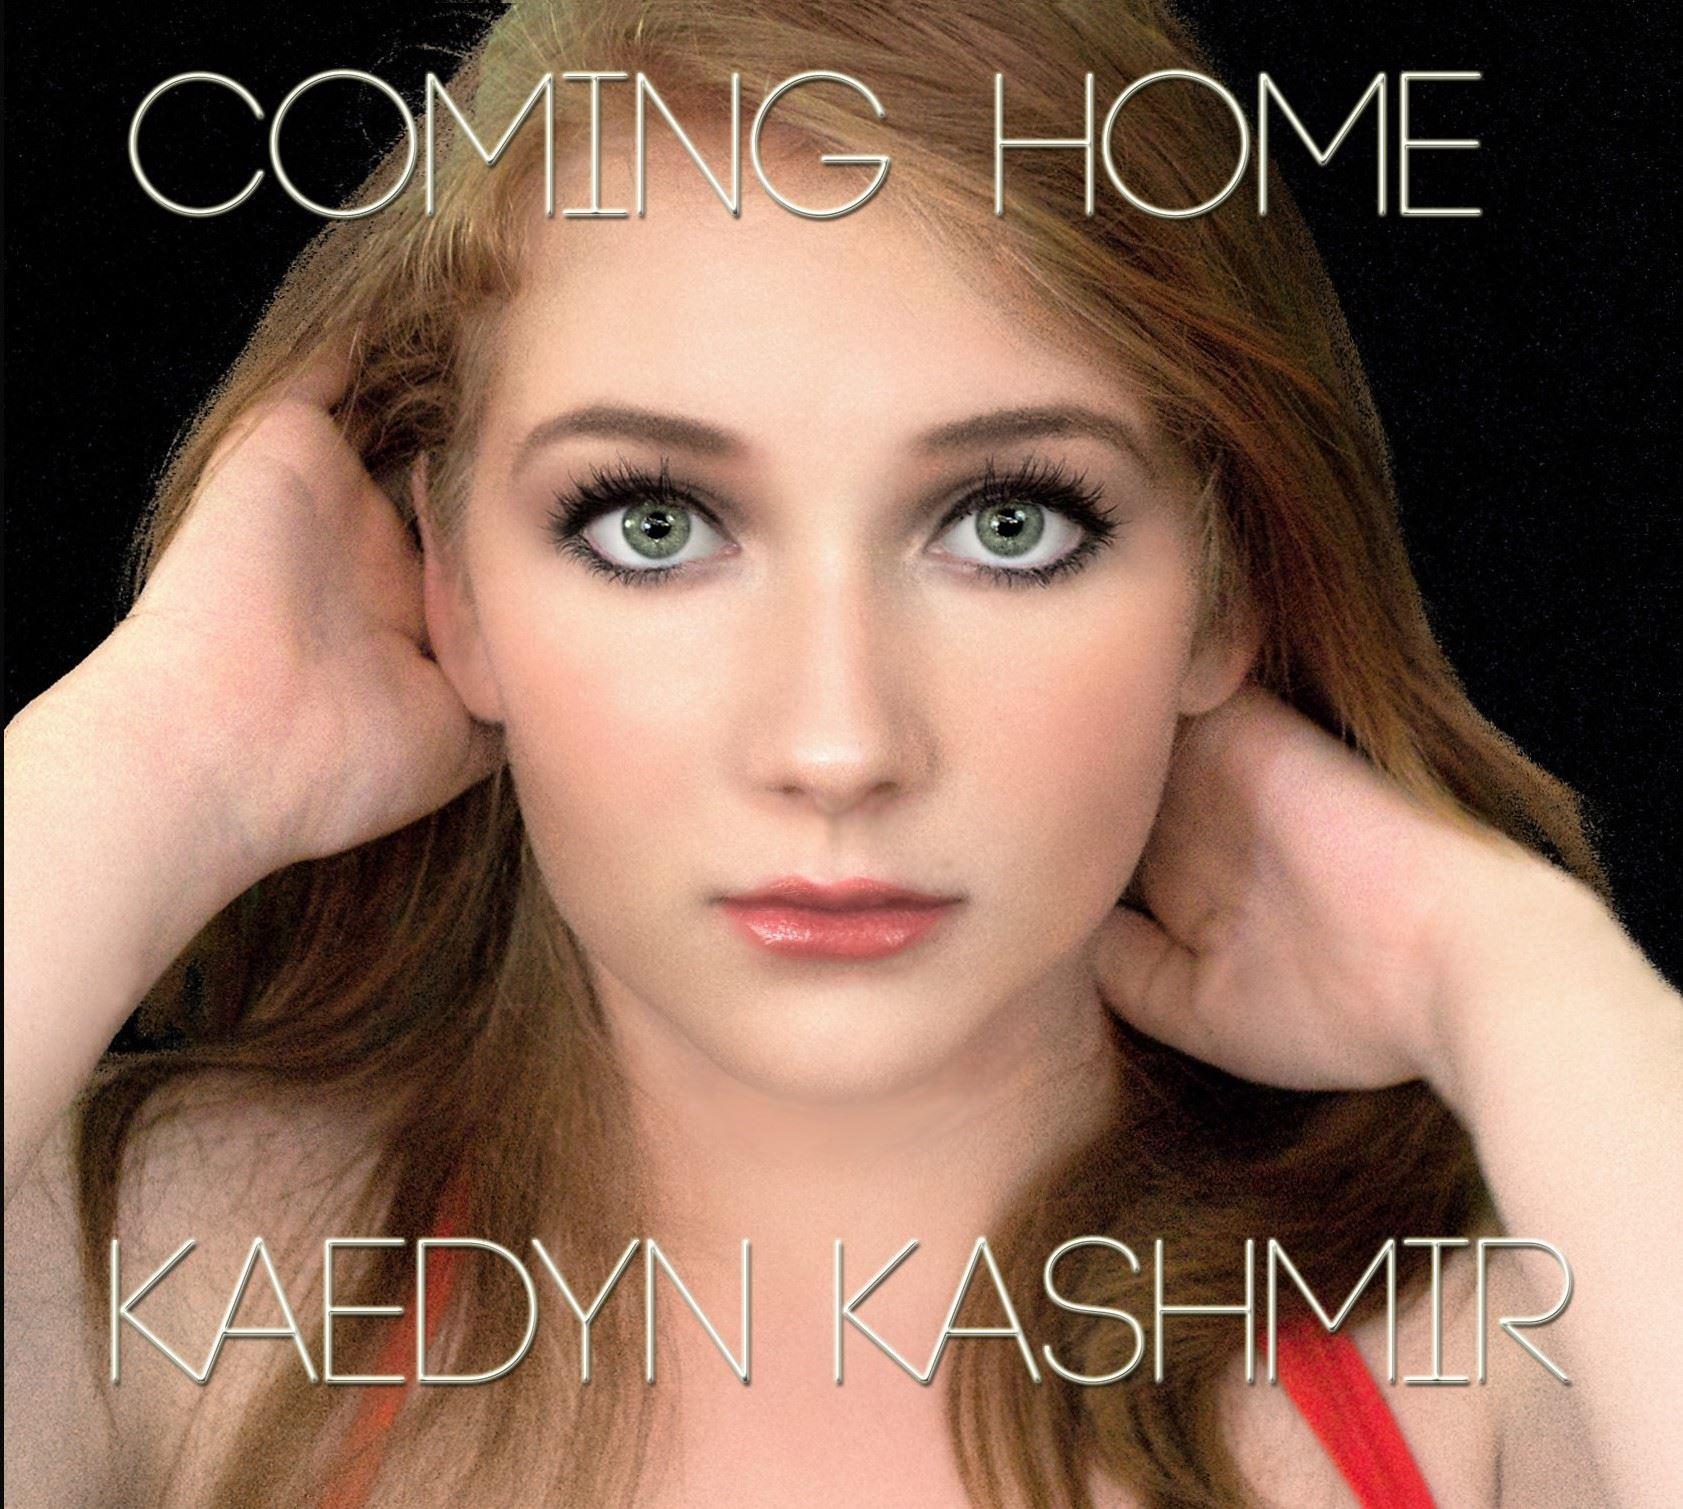 KAEDYN FRONT ALBUM COVER